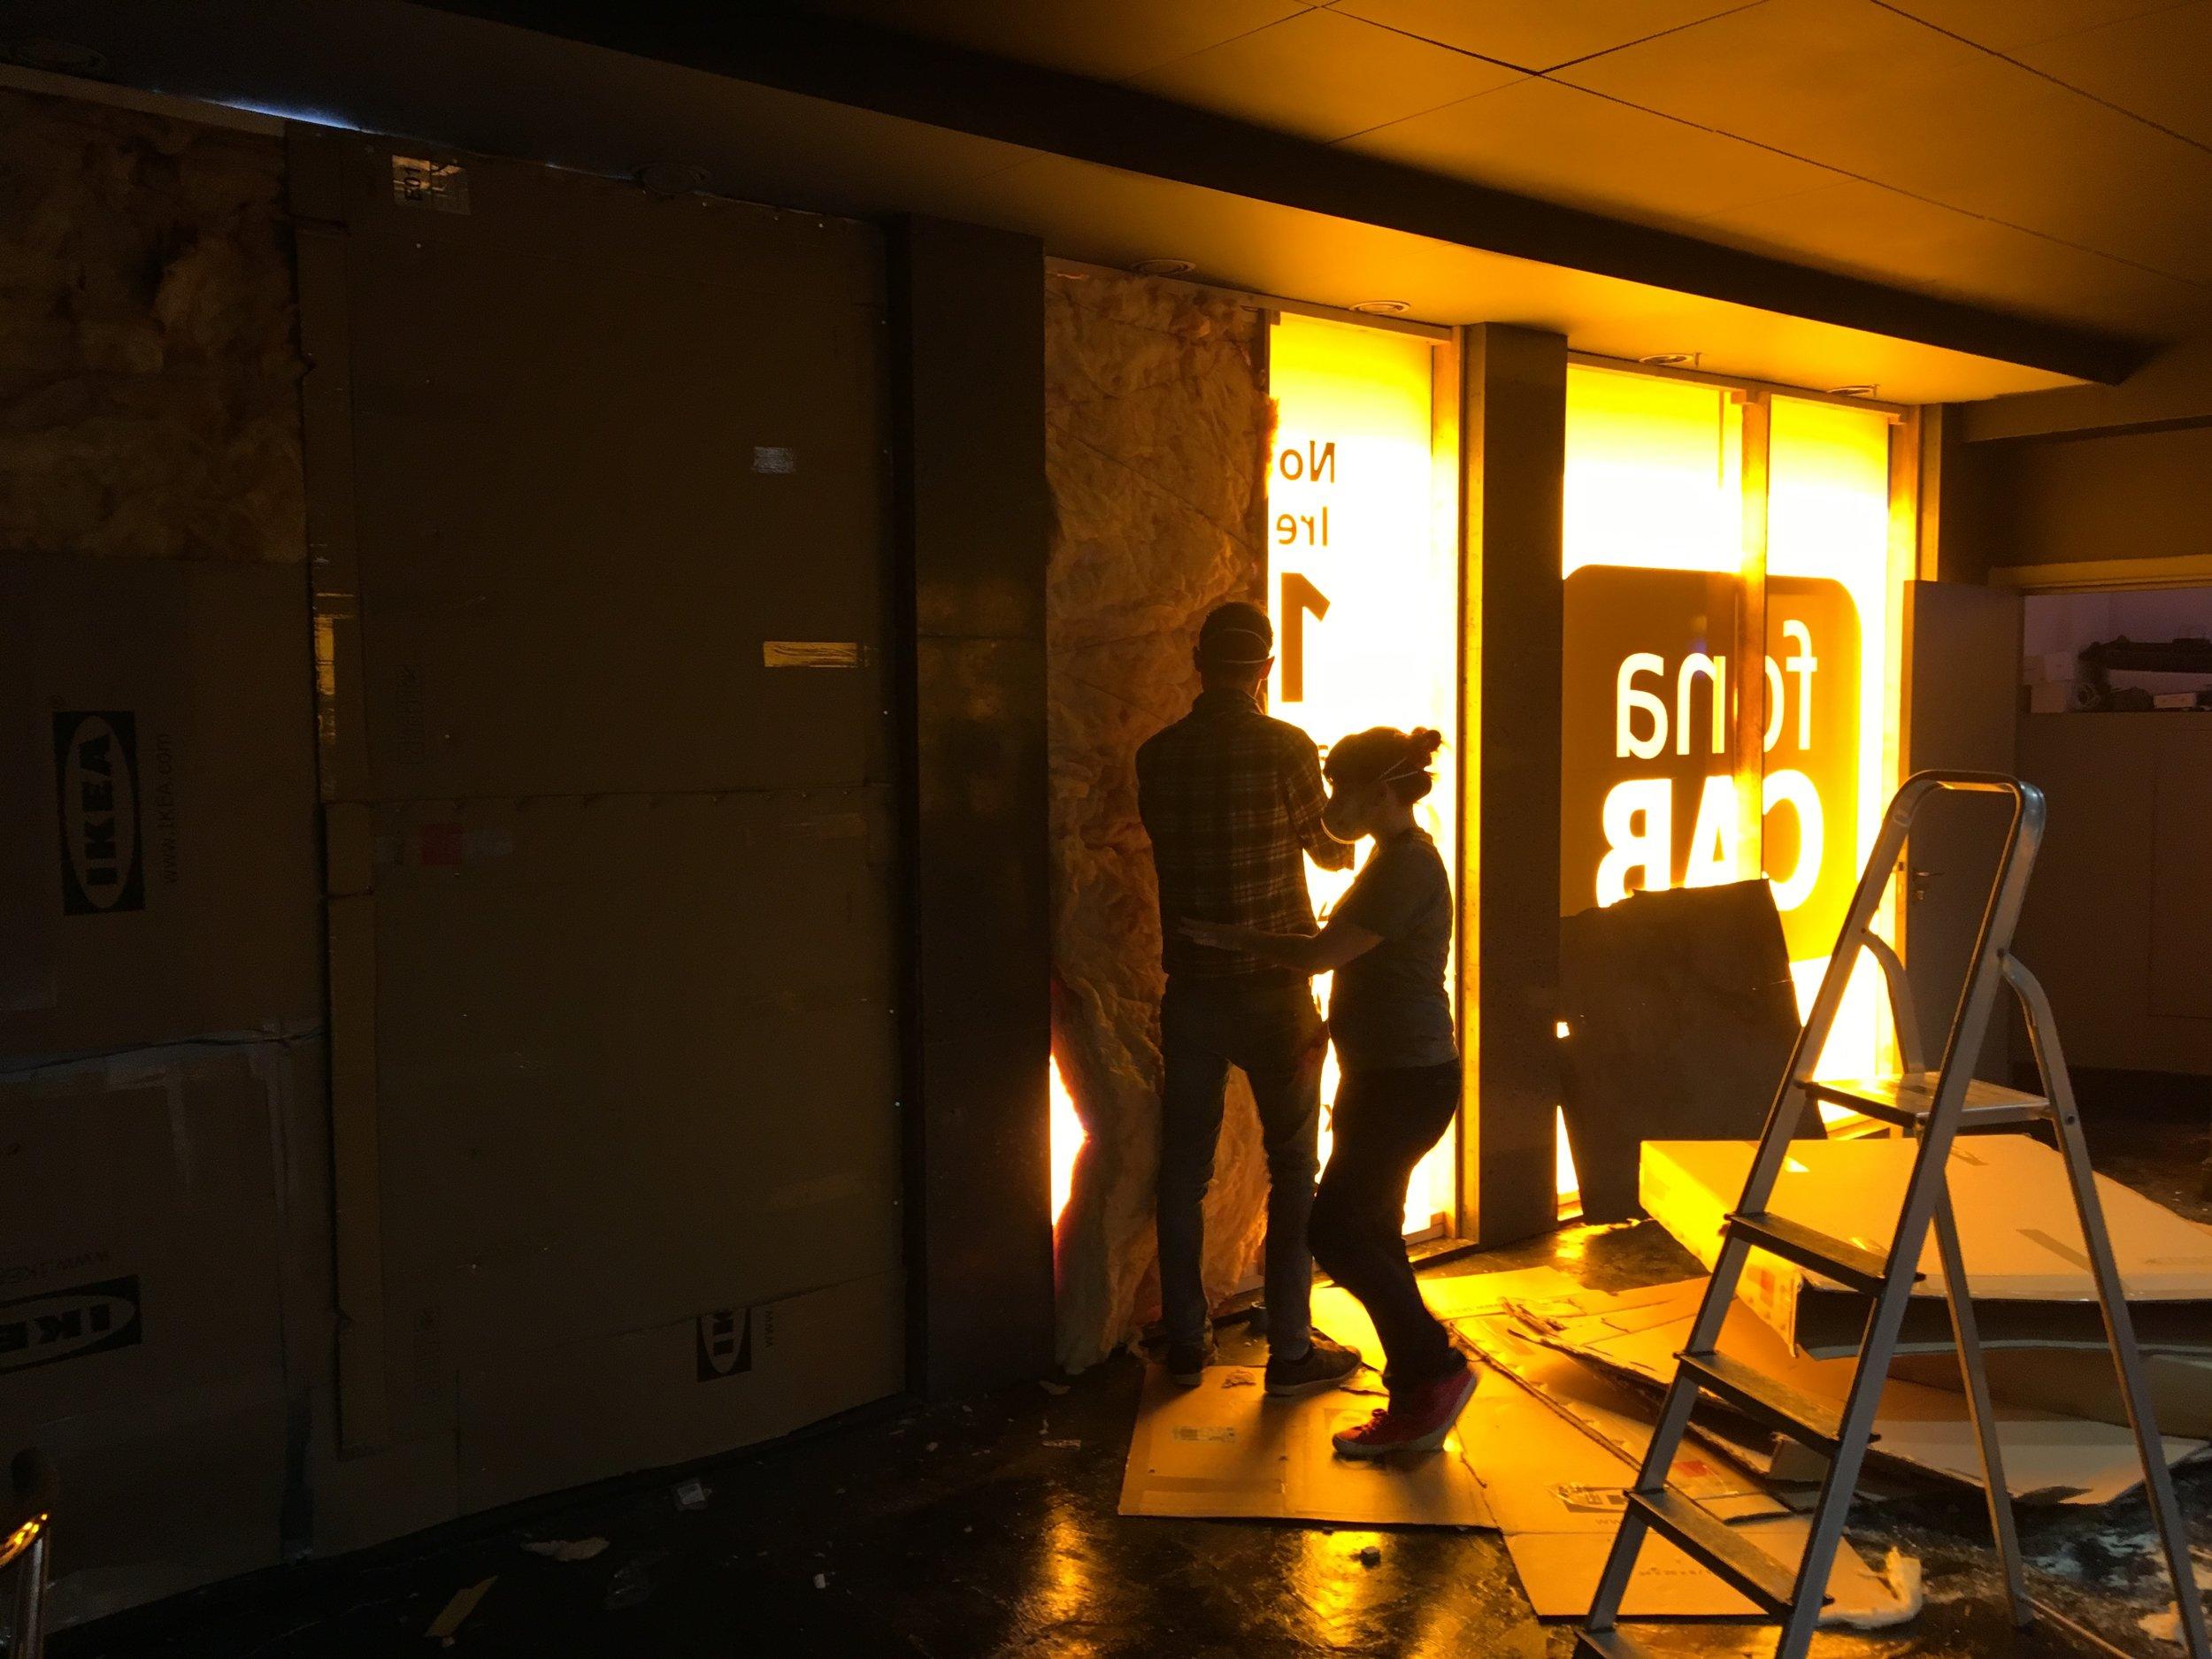 Gemma & David start insulating the windows in the theatre